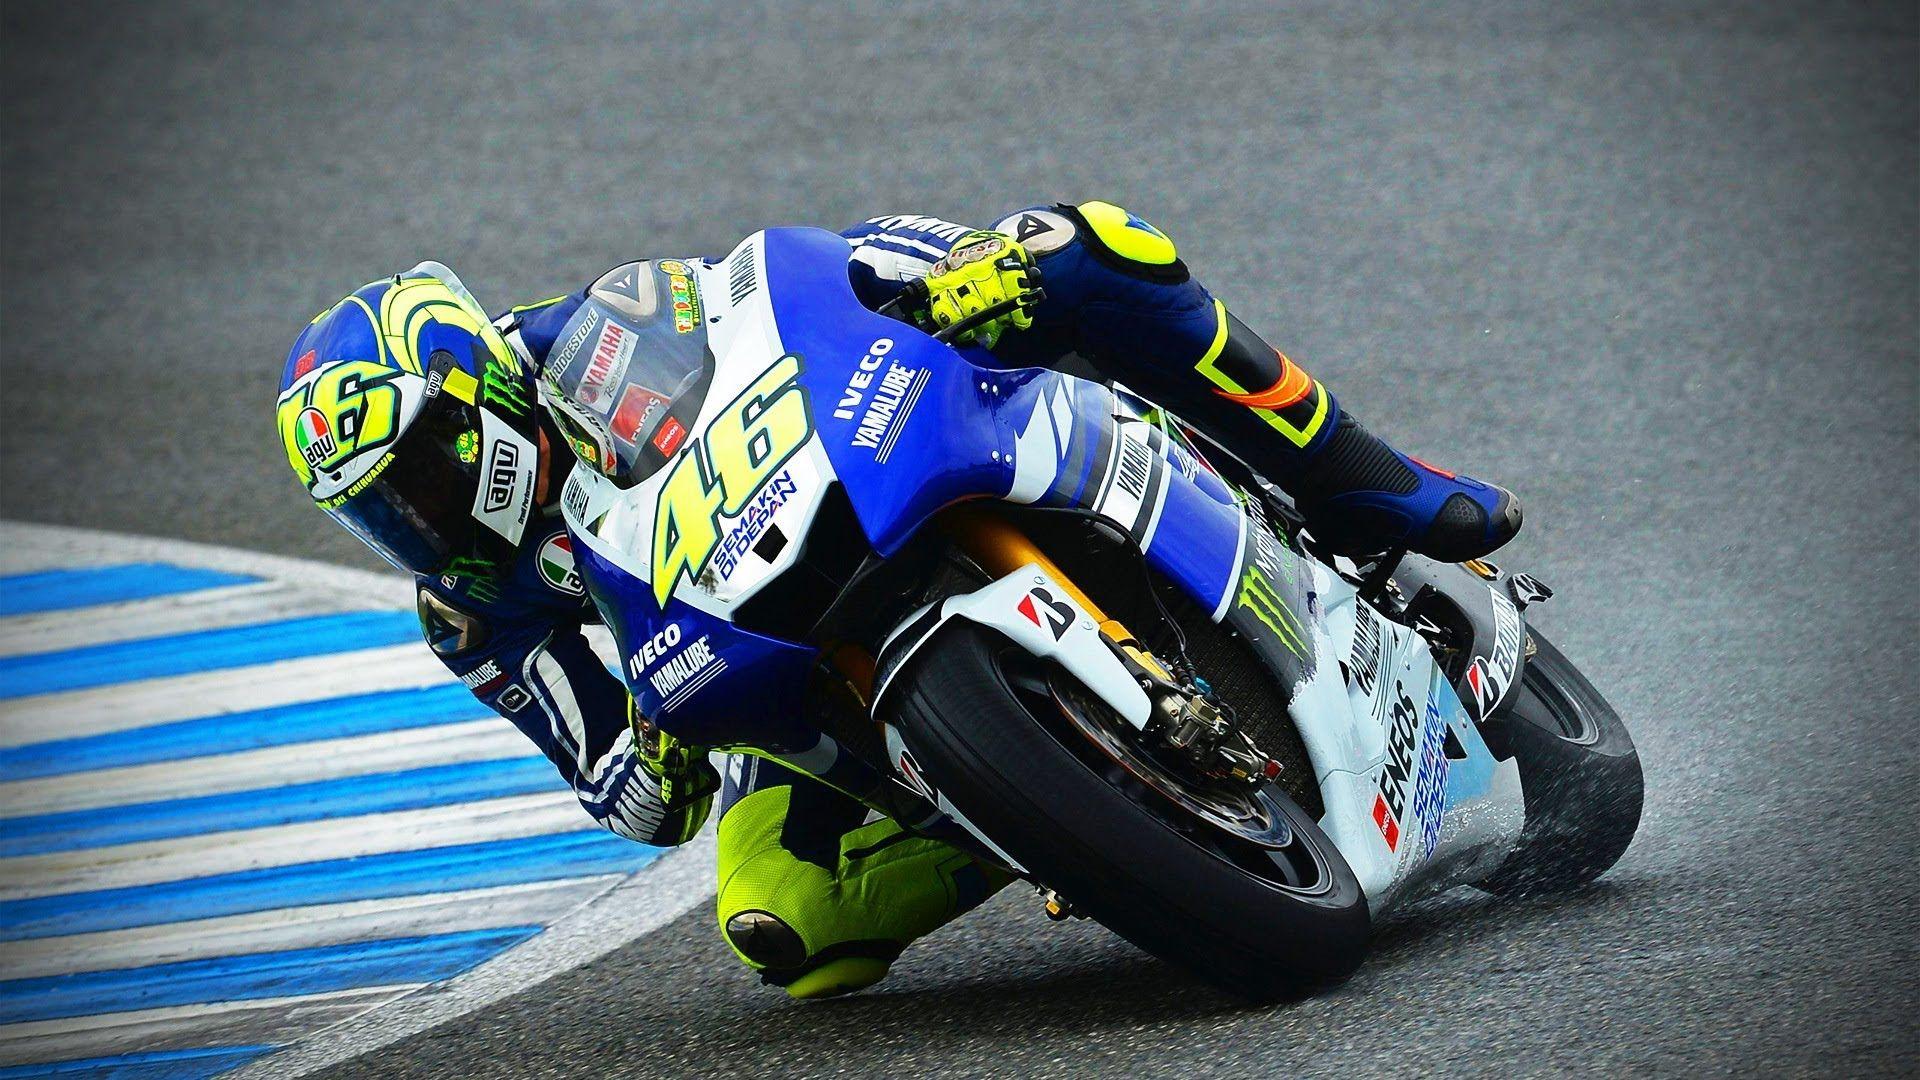 Rossi mobili ~ Image for motogp 2013 valentino rossi u2013 gran premio u2013 qatar